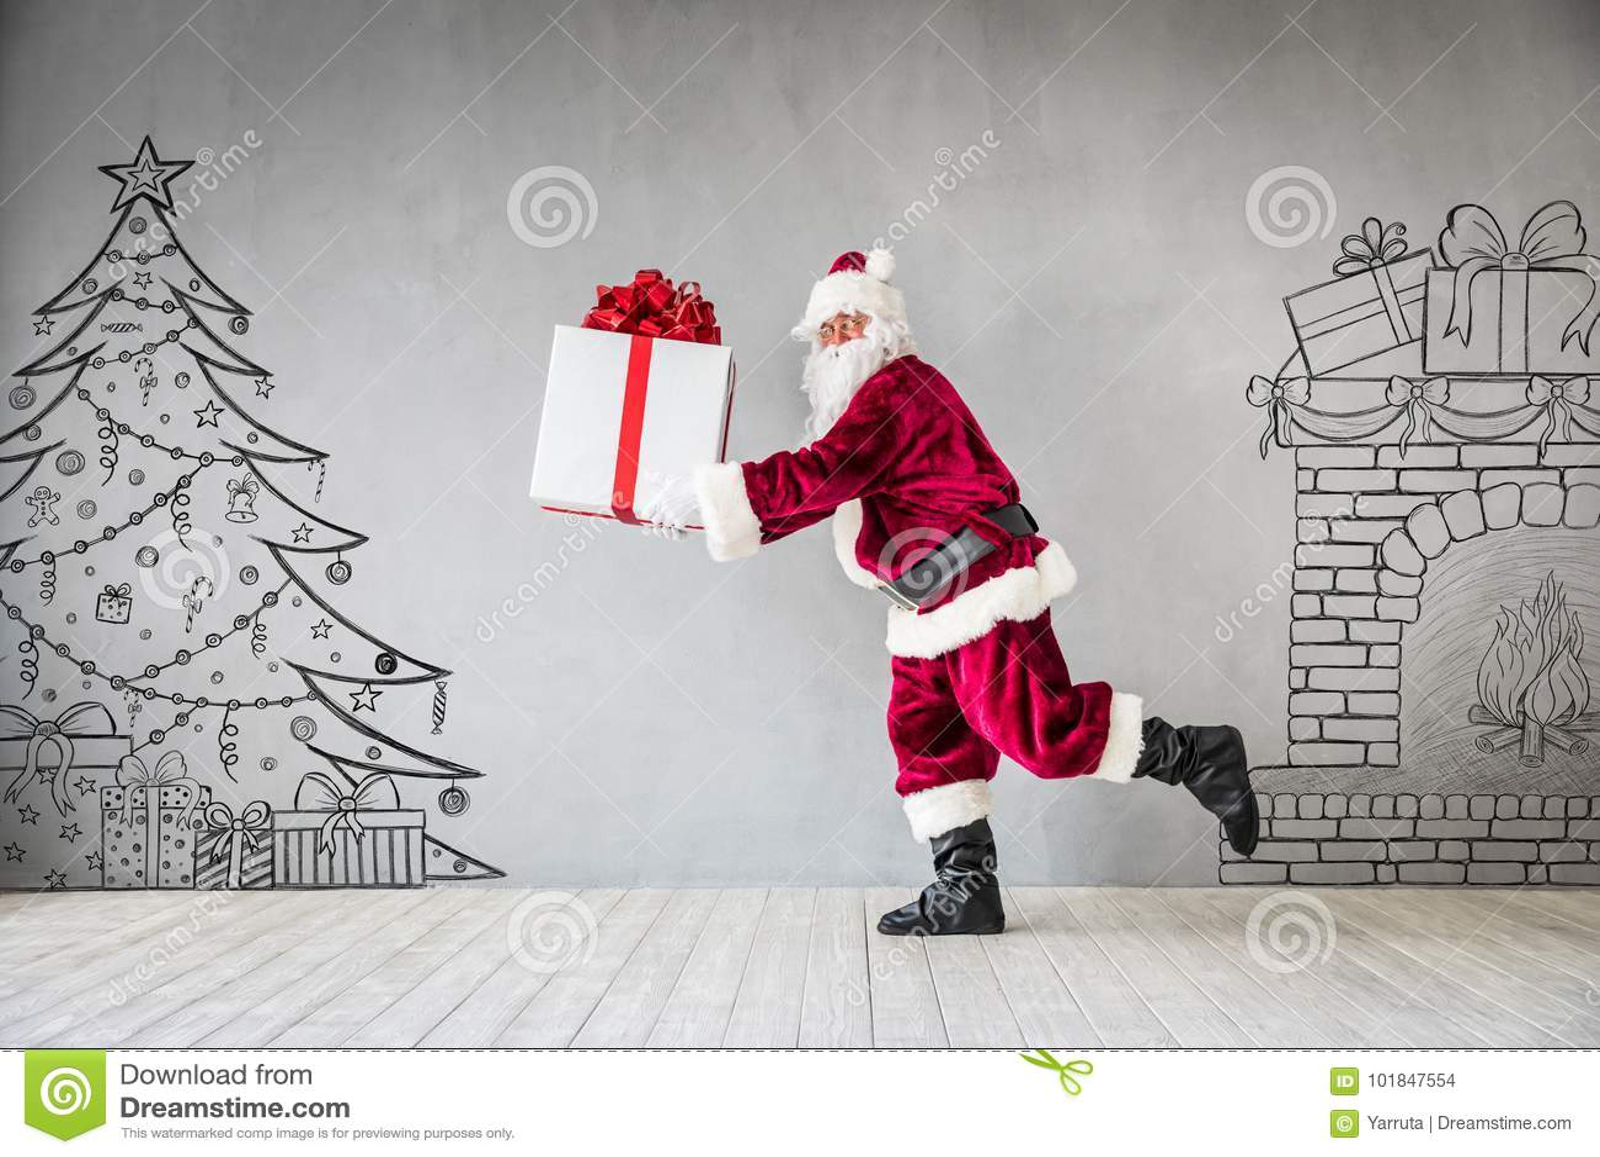 Santa Claus Christmas Xmas Holiday Concept Stock Photo - Image of ...